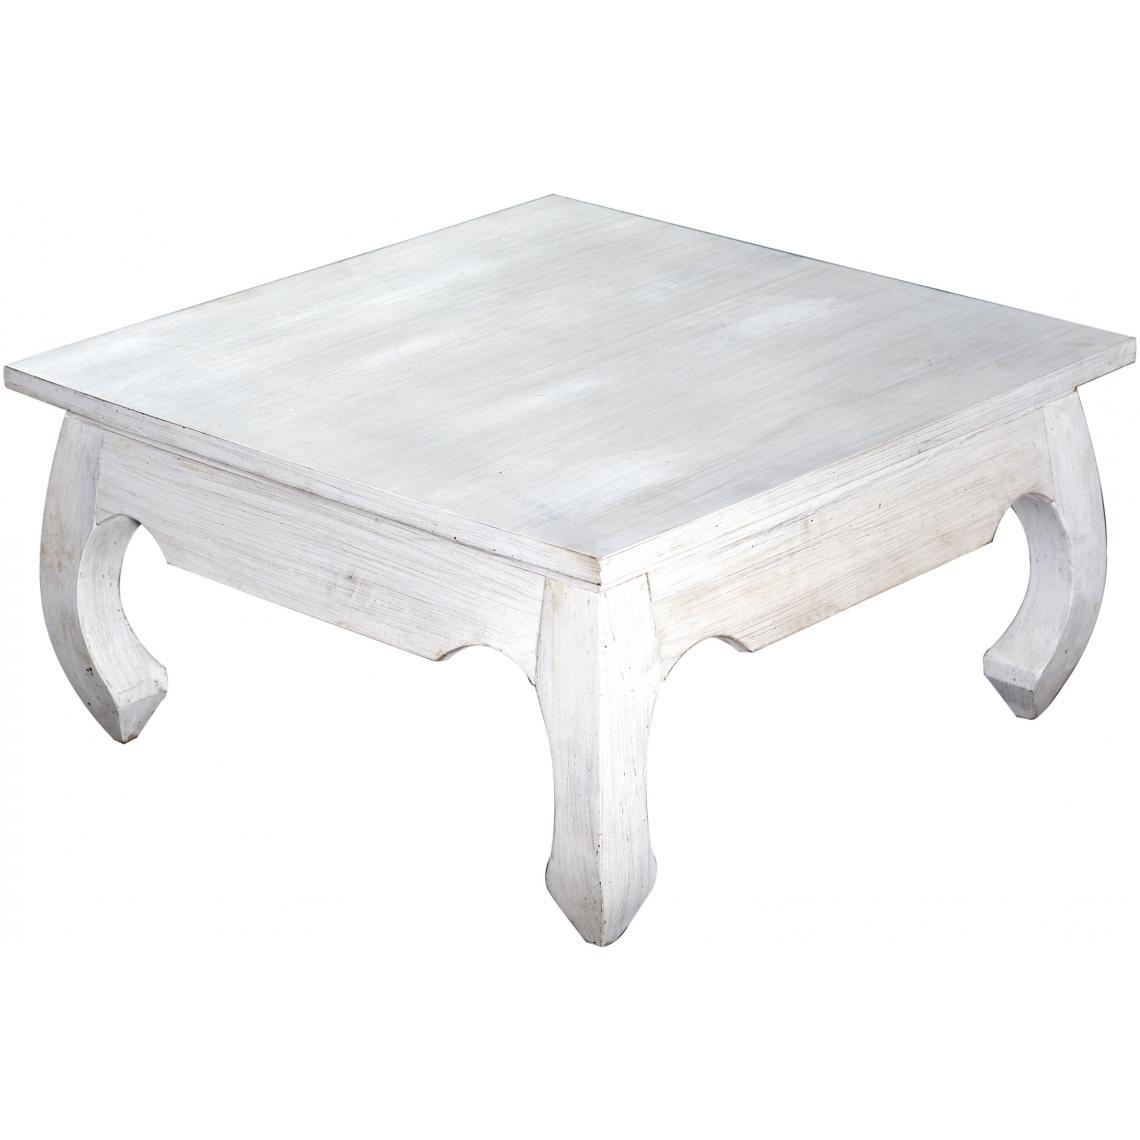 table basse carree en bois blanc